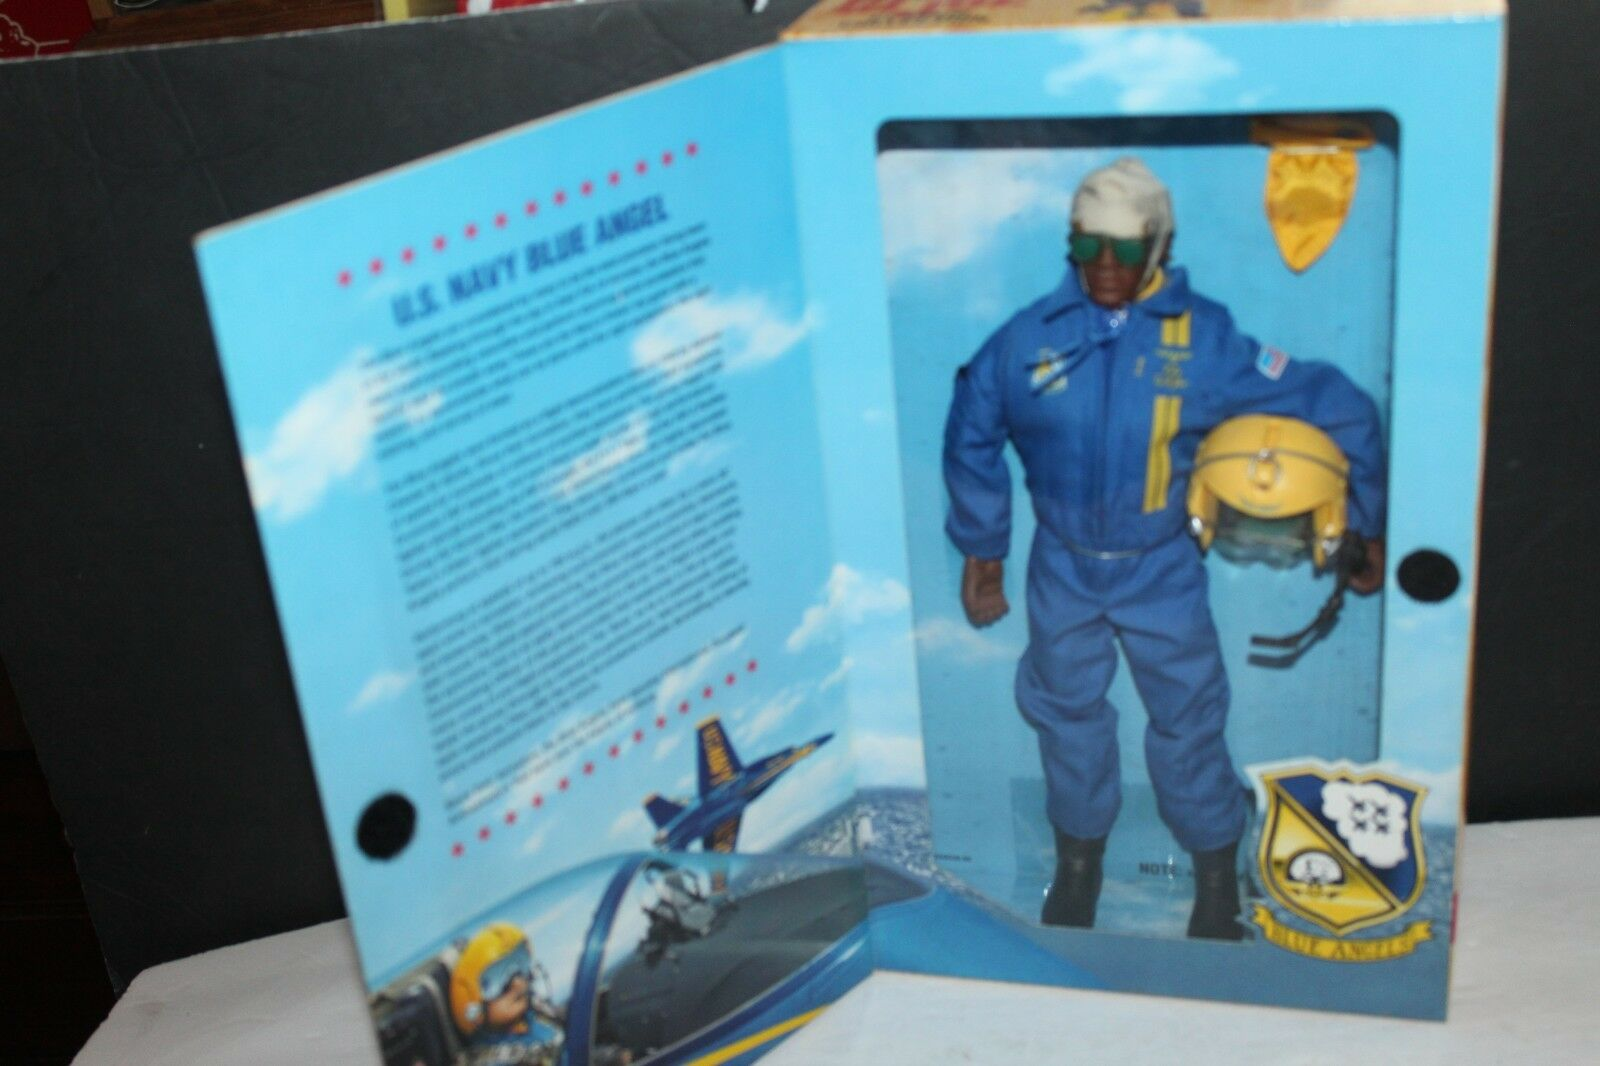 G.I. JOE CLASSIC COLLECTION U.S. NAVY AFRICAN AMERICAN blueE ANGEL MIB